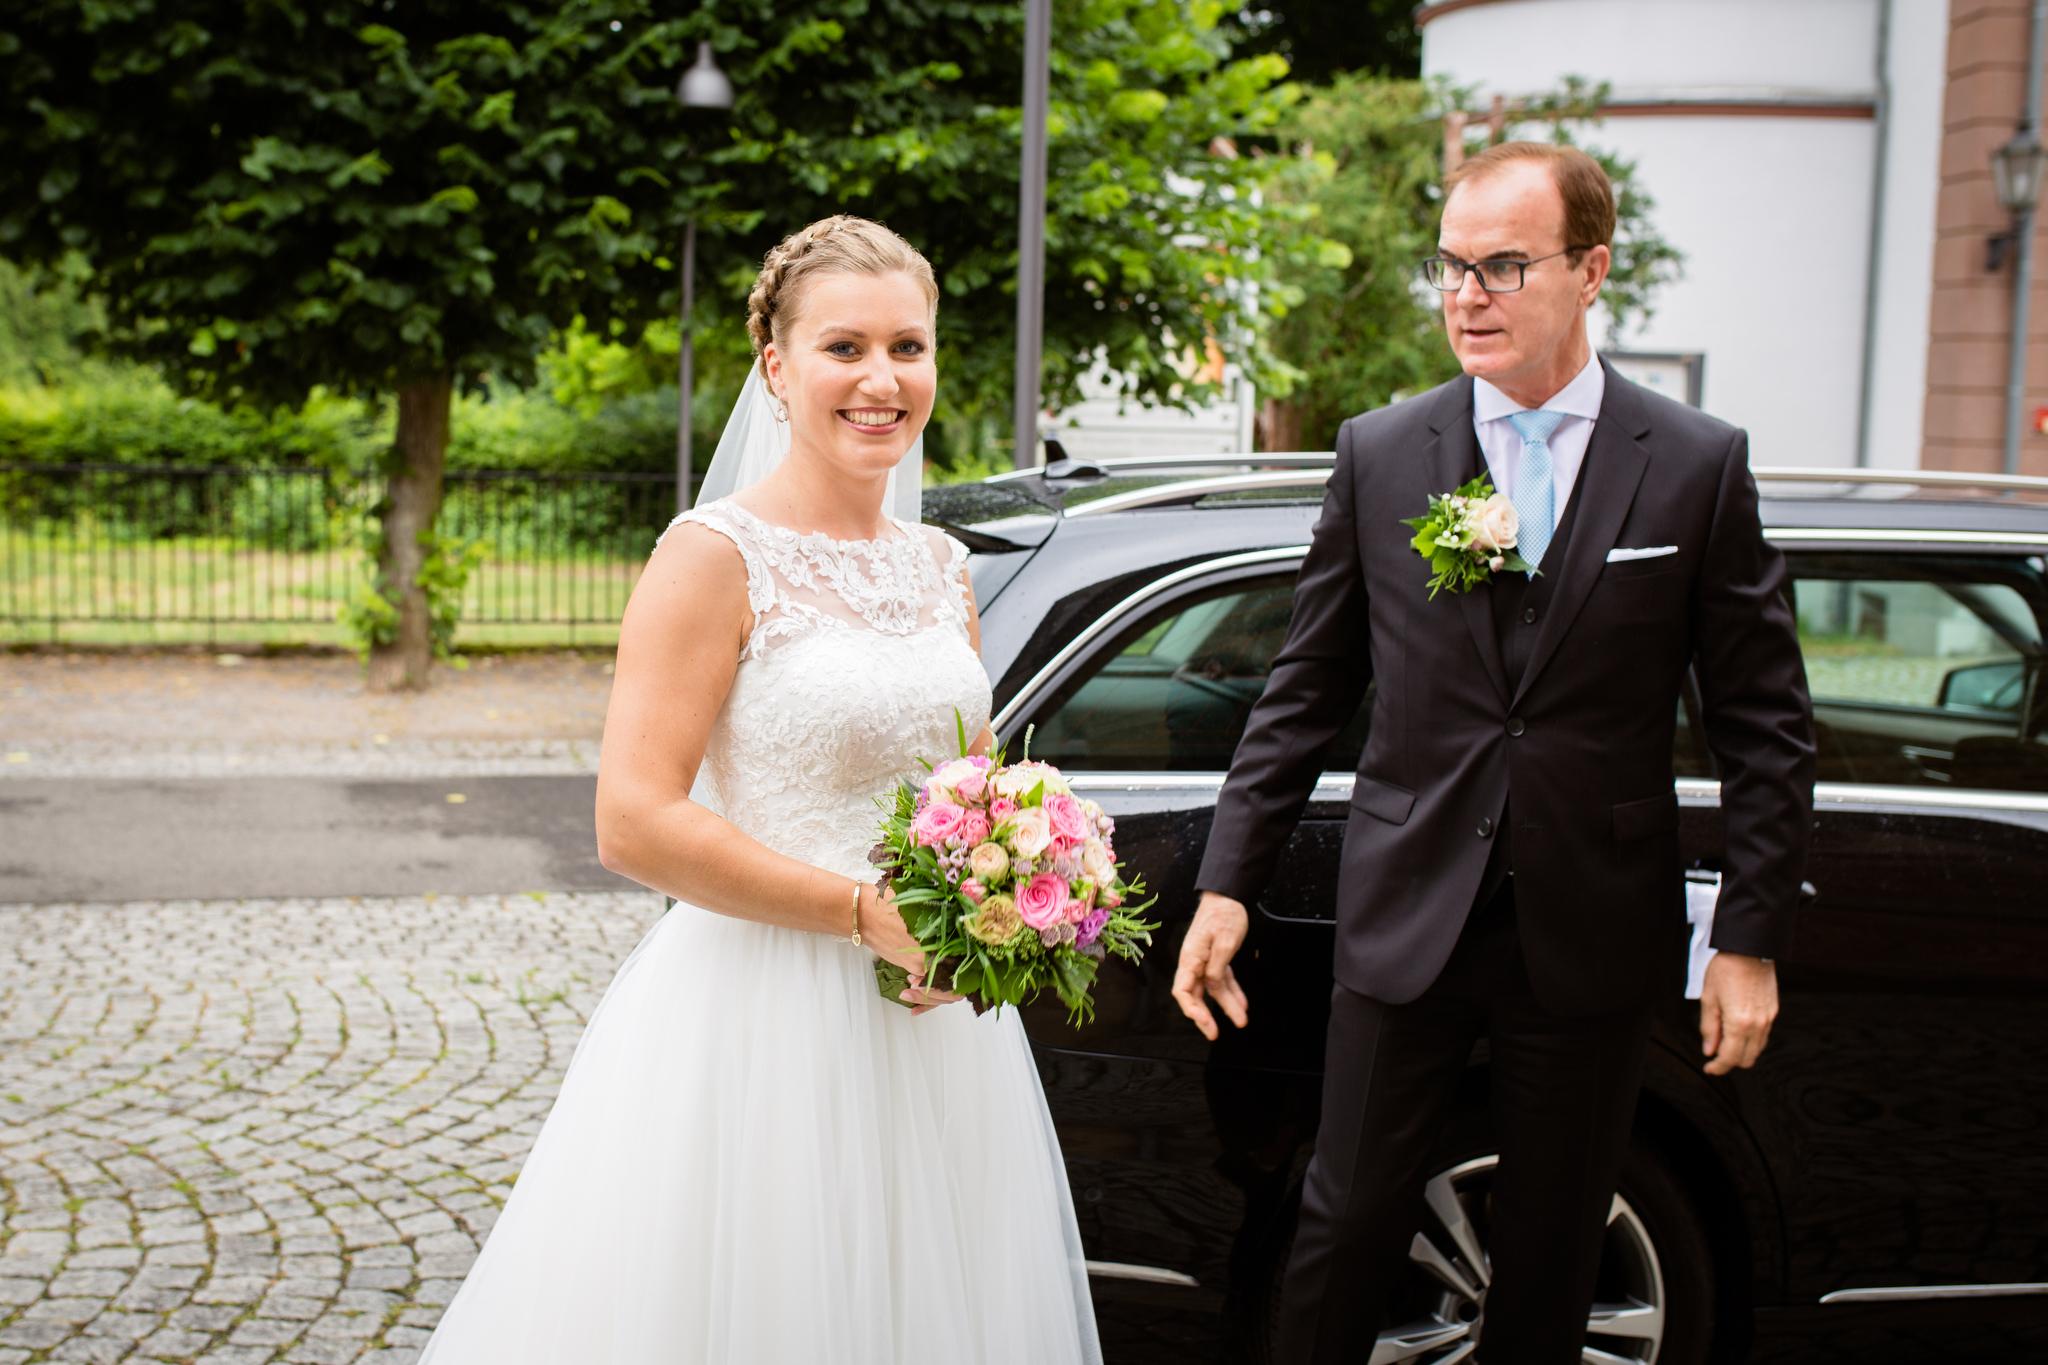 Claudia Krawinkel Fotografie Hochzeitsfotograf Essen Düsseldorf Dormagen Kloster Knechtsteden Hochzeitsreportage Hochzeit Knechtsteden43